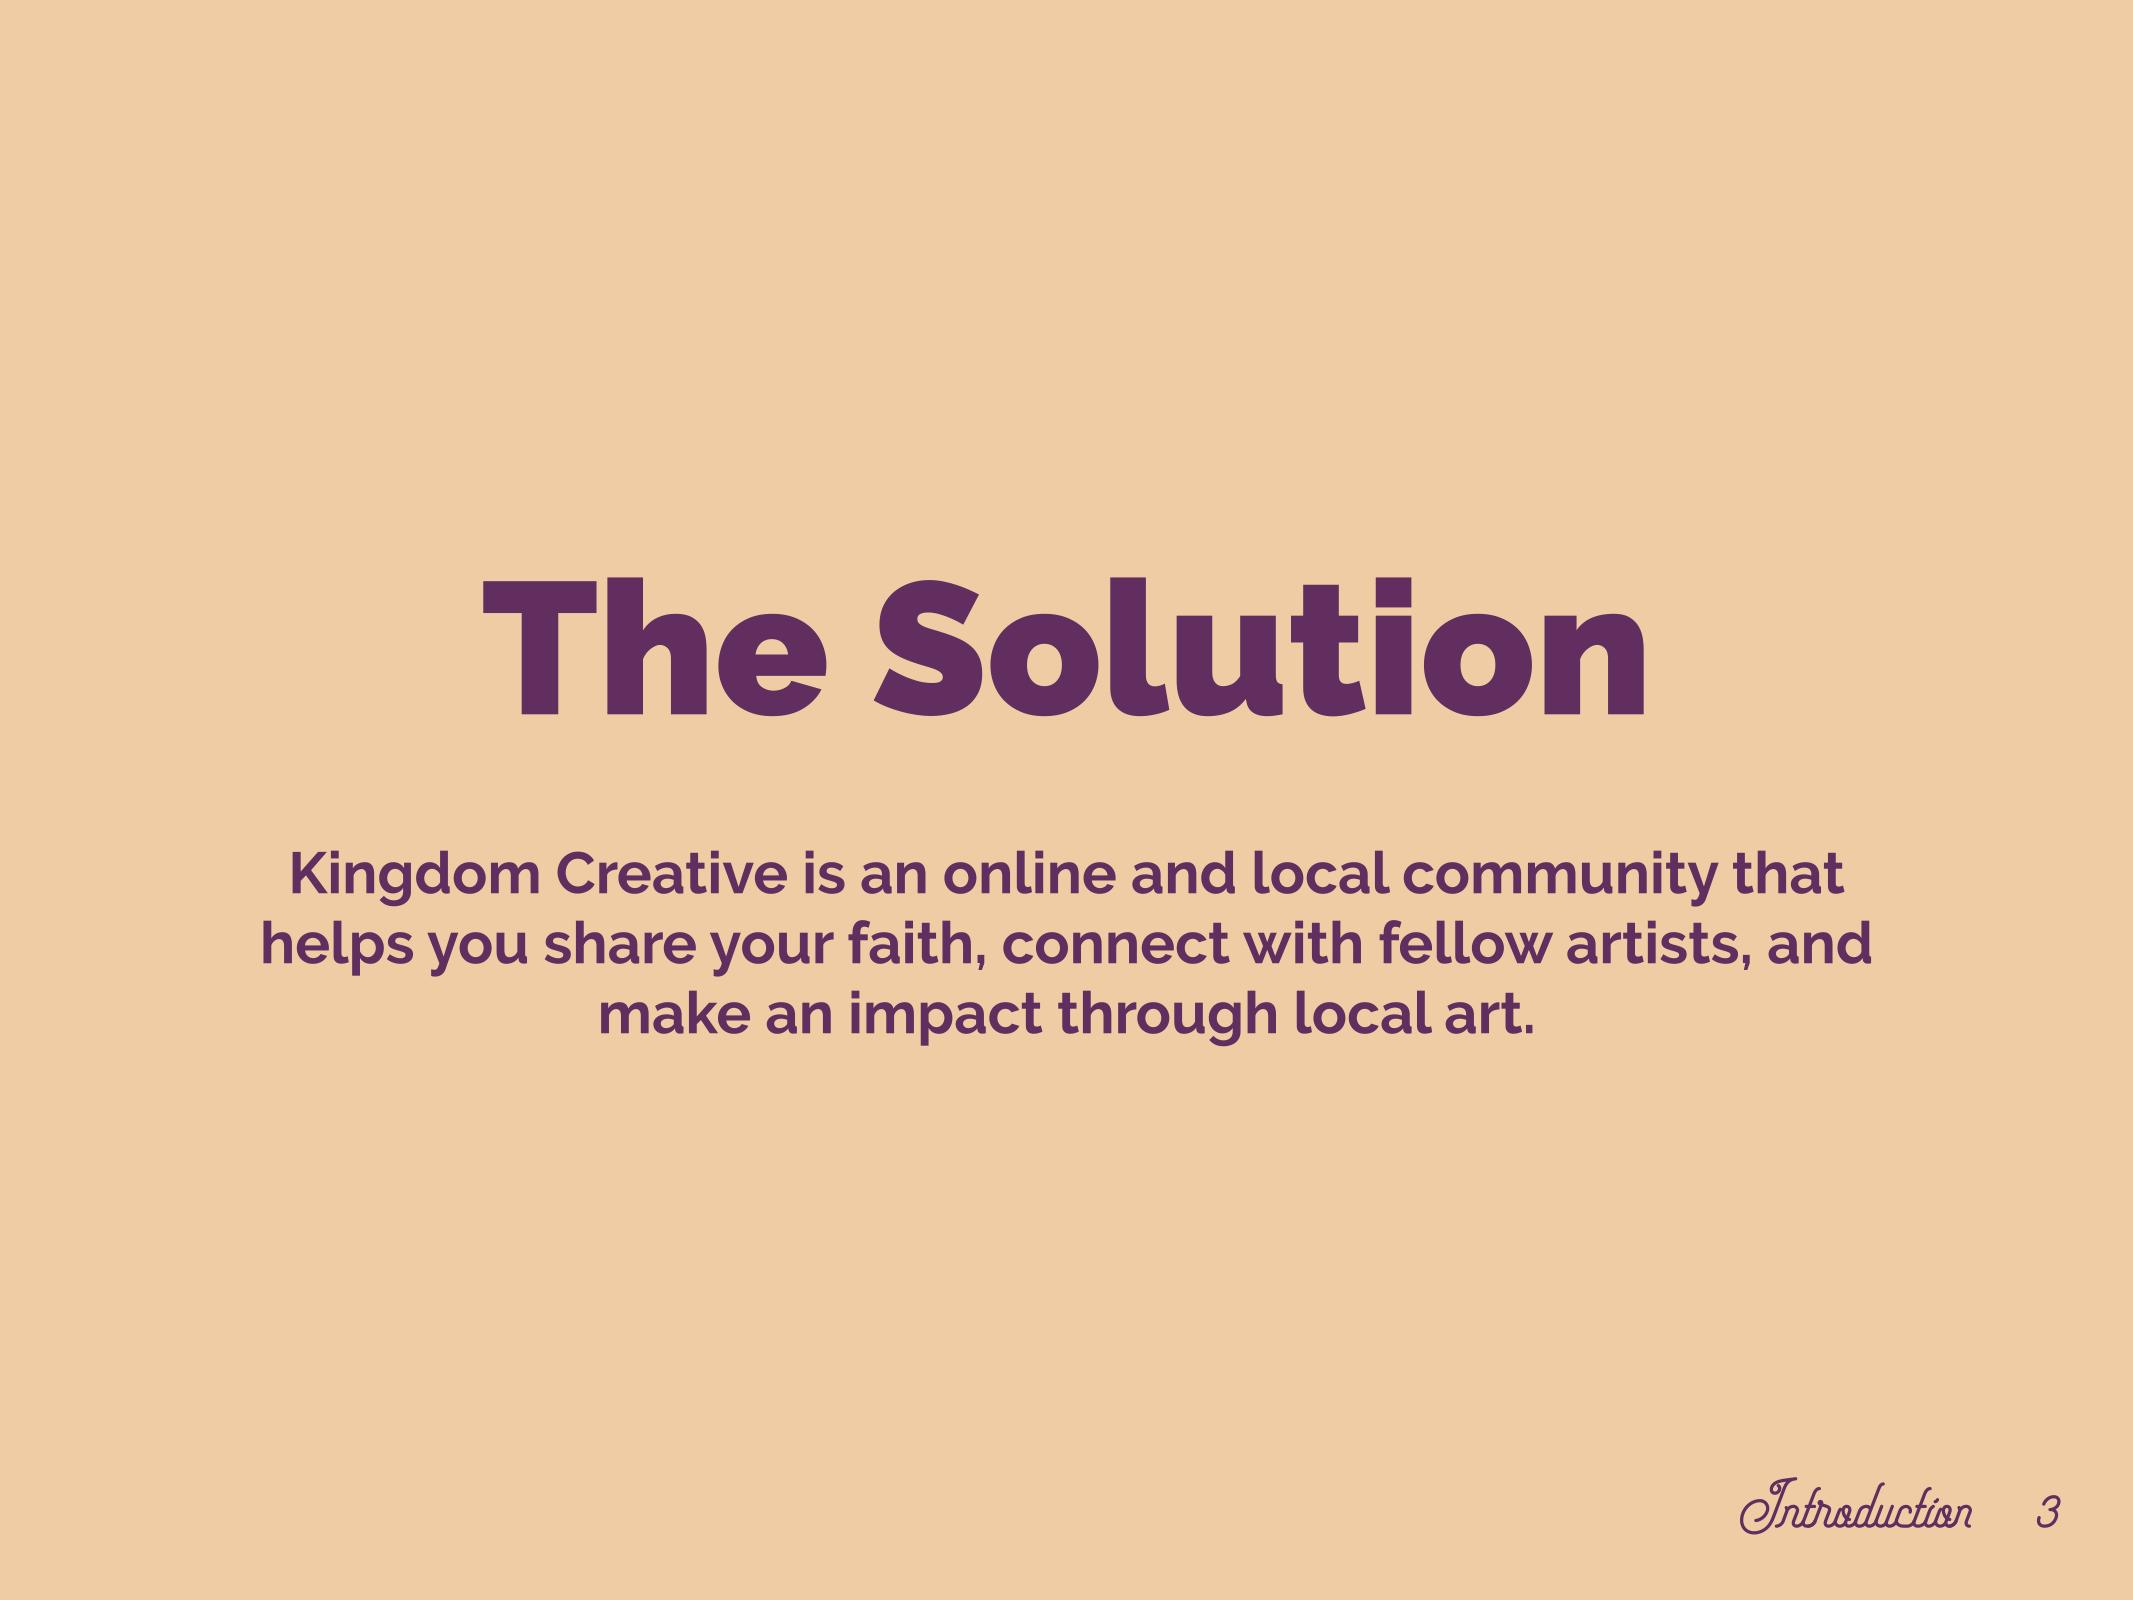 Kingdom_Creative-presentationlow_8-12-18 (1)-2 (dragged).png